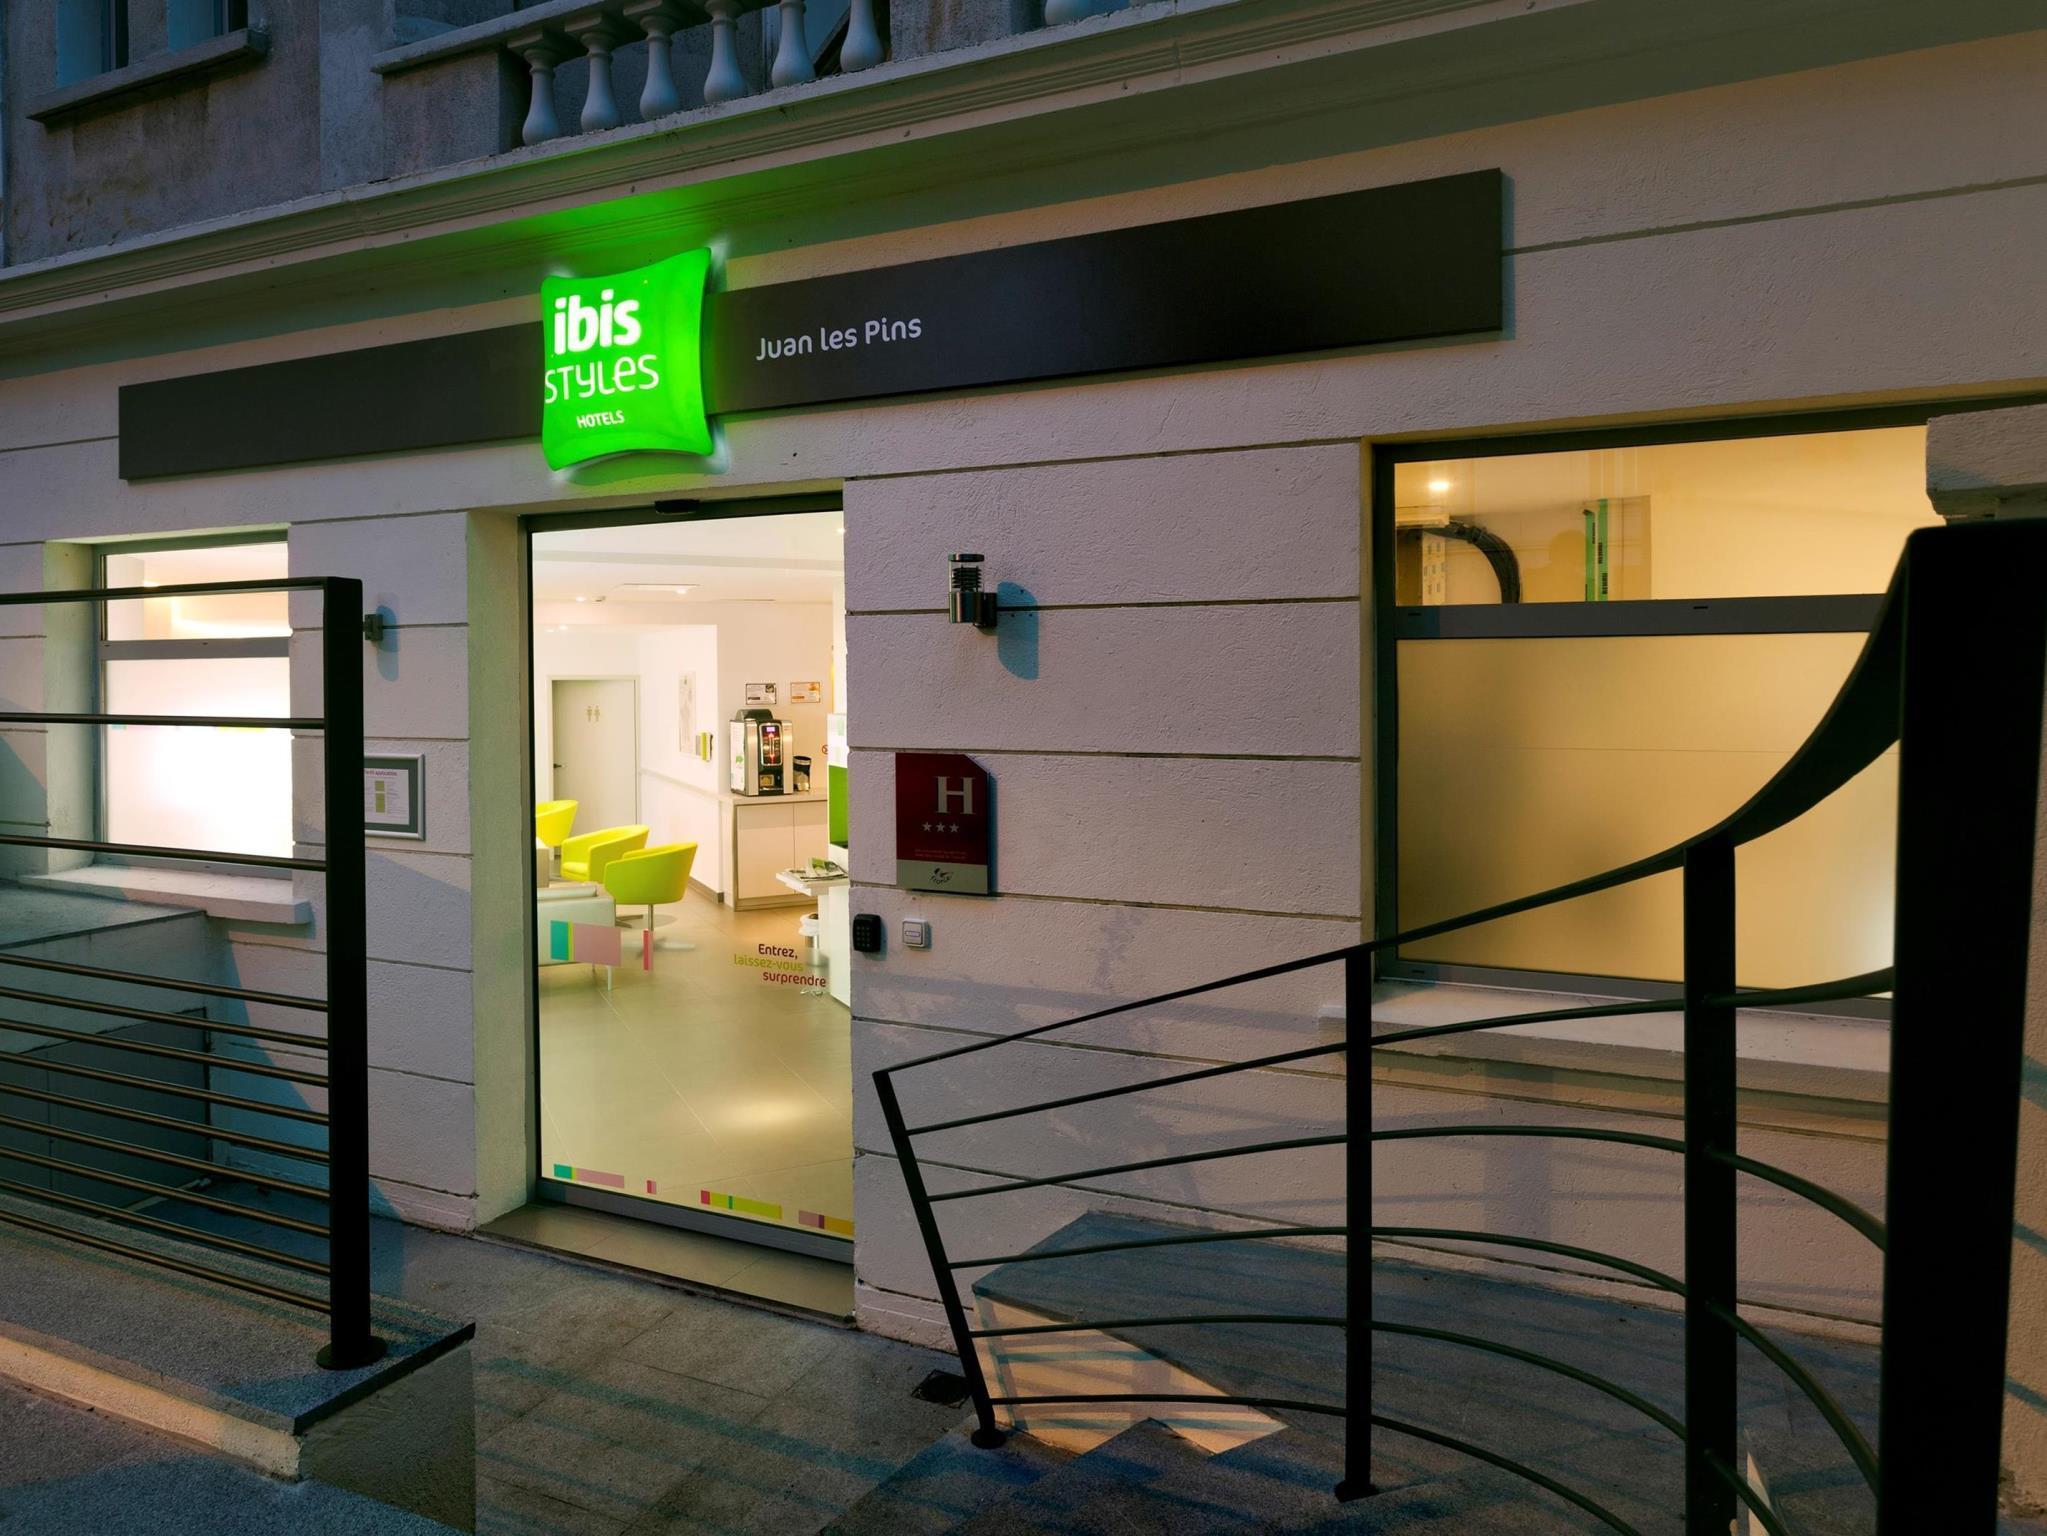 Ibis Styles Juan Les Pins Hotel